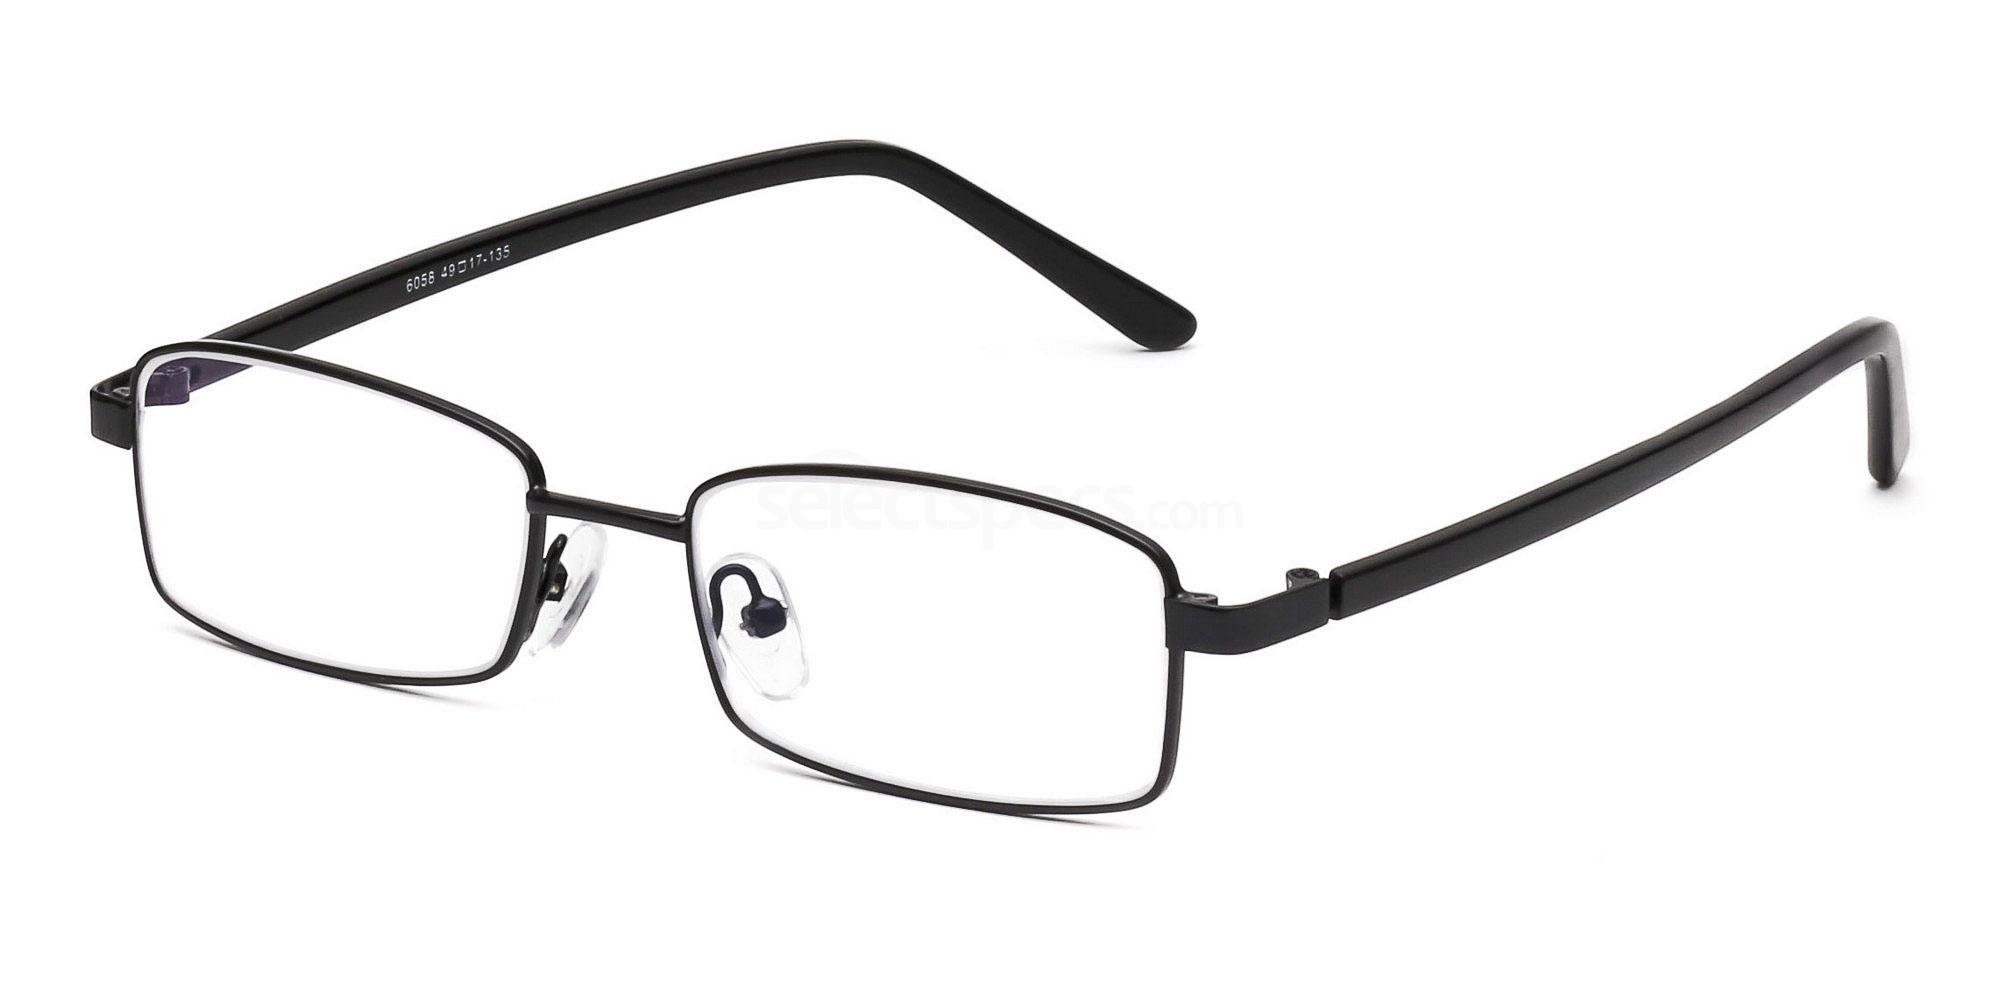 Savannah-6058-prescription-glasses-for-a-tenner